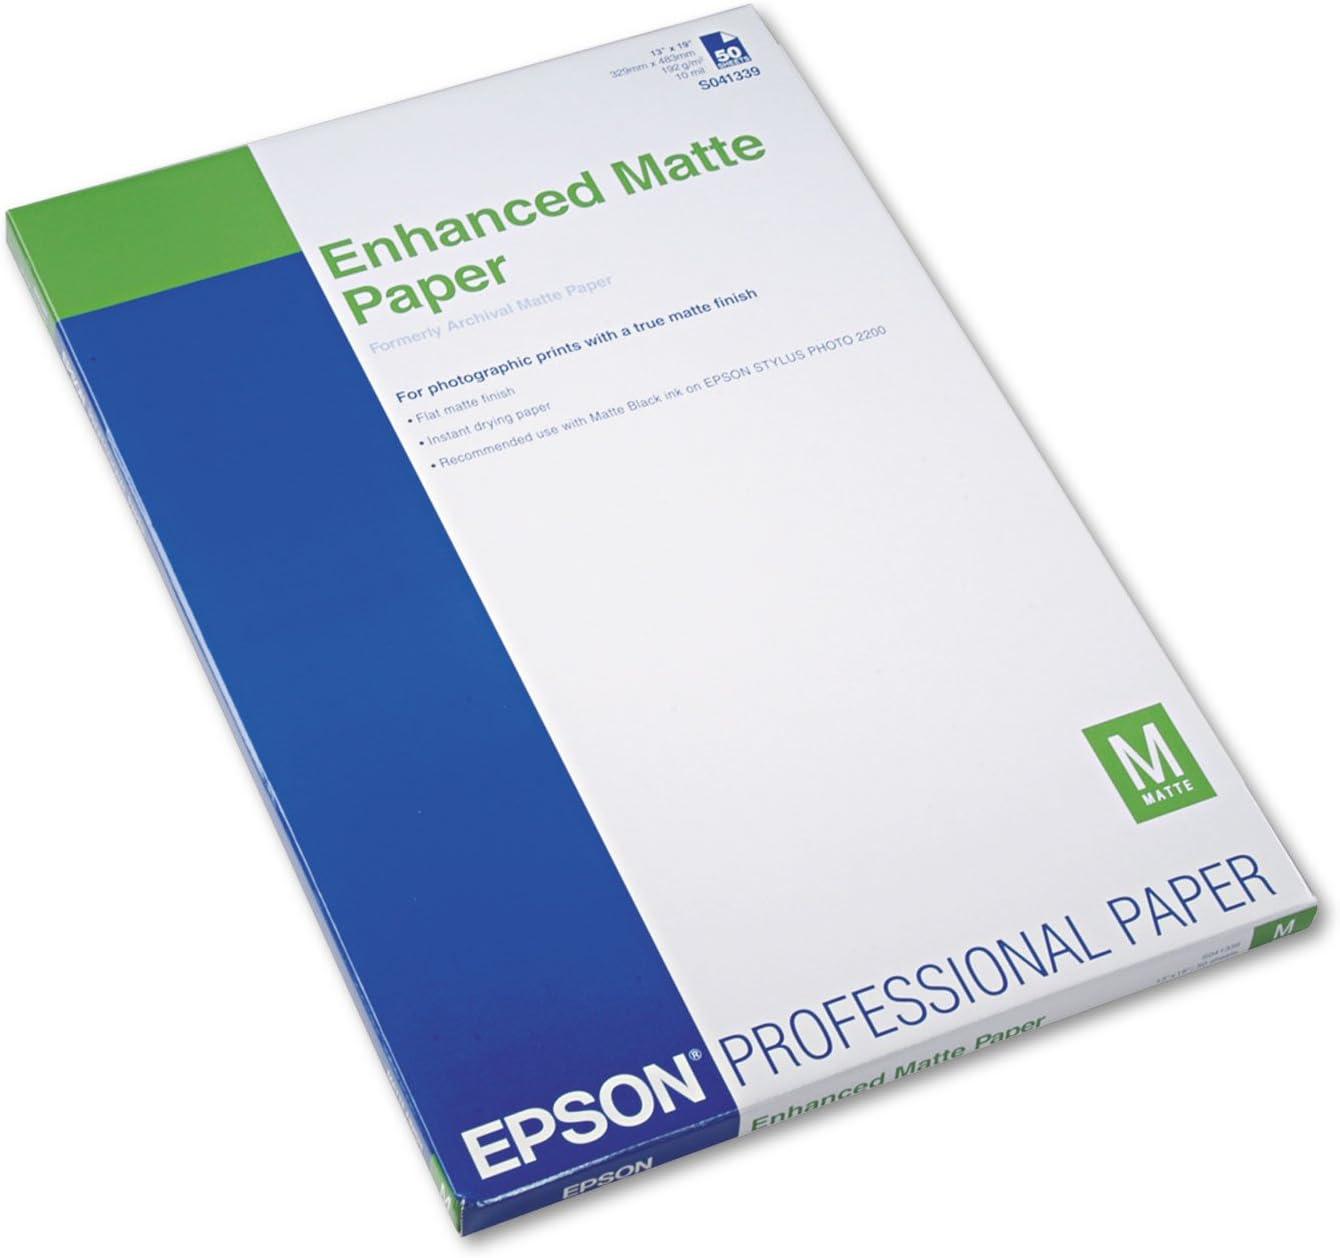 Fashion Epson Enhanced Matte Paper 50 S041343 sheets lowest price A3 - 11.7x16.5